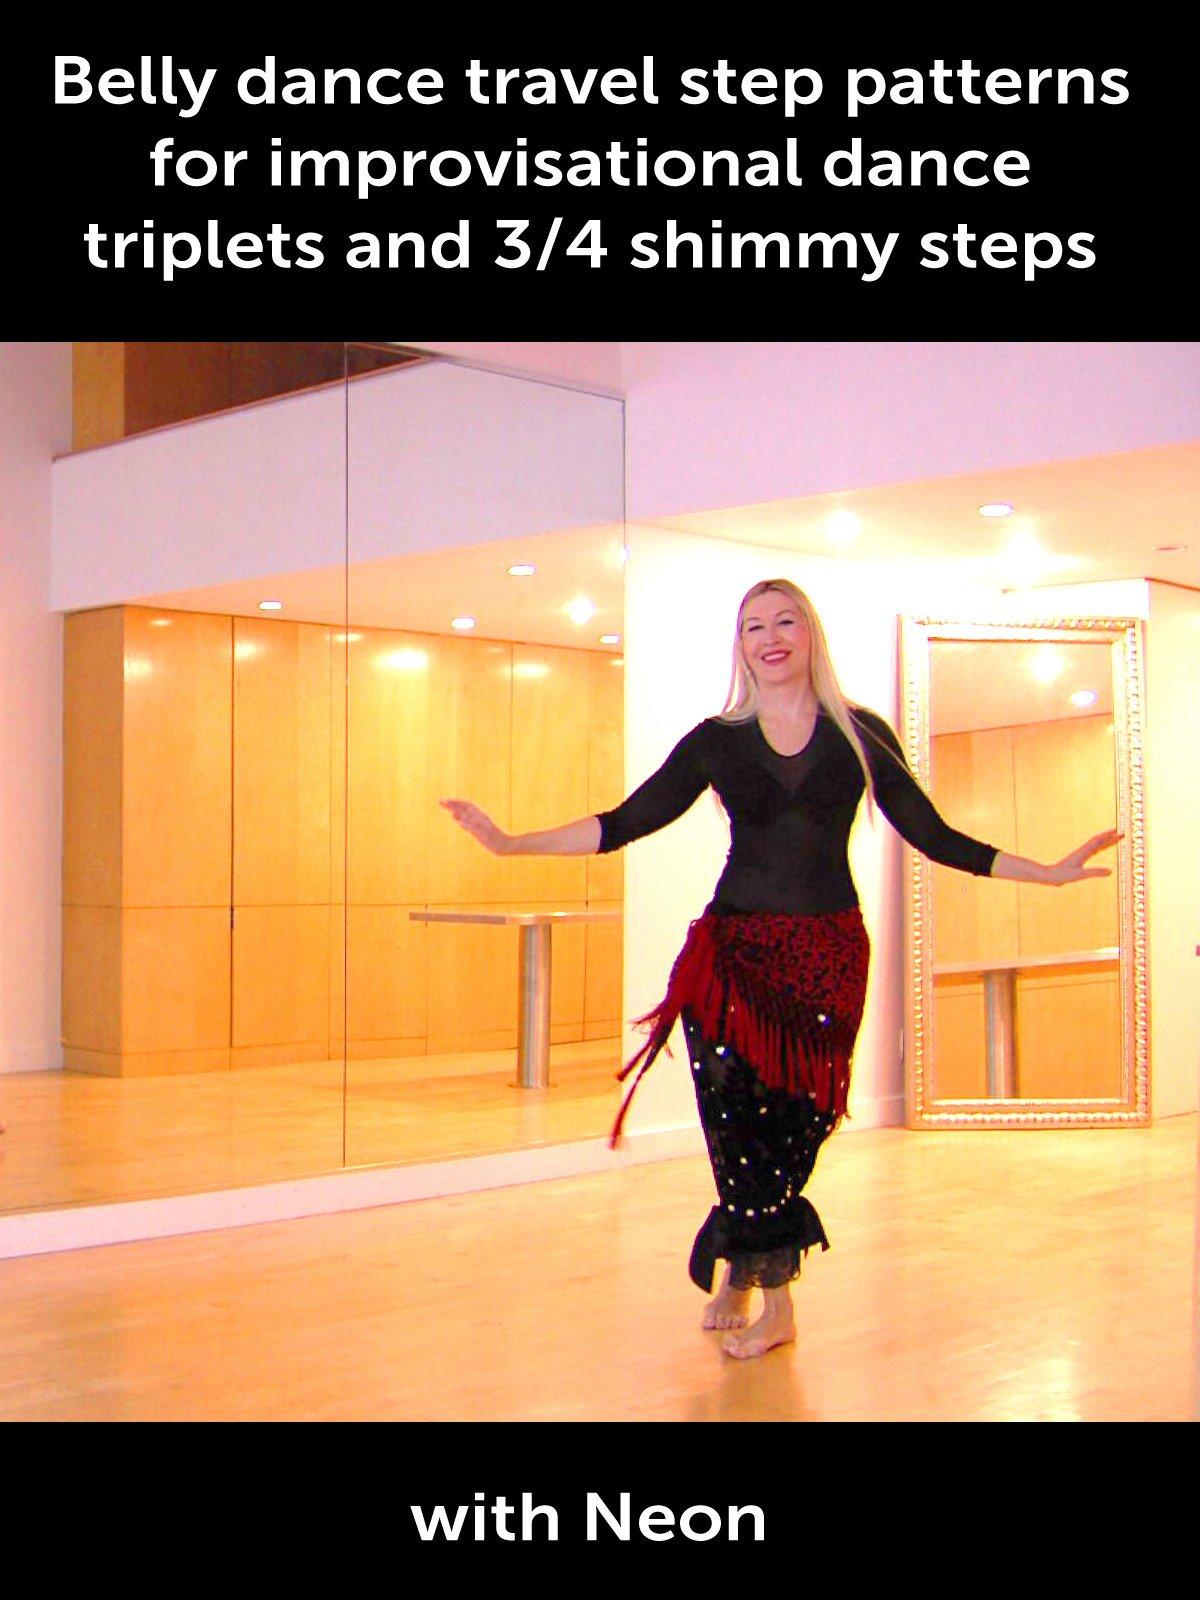 Belly dance travel step patterns for improvisational dance